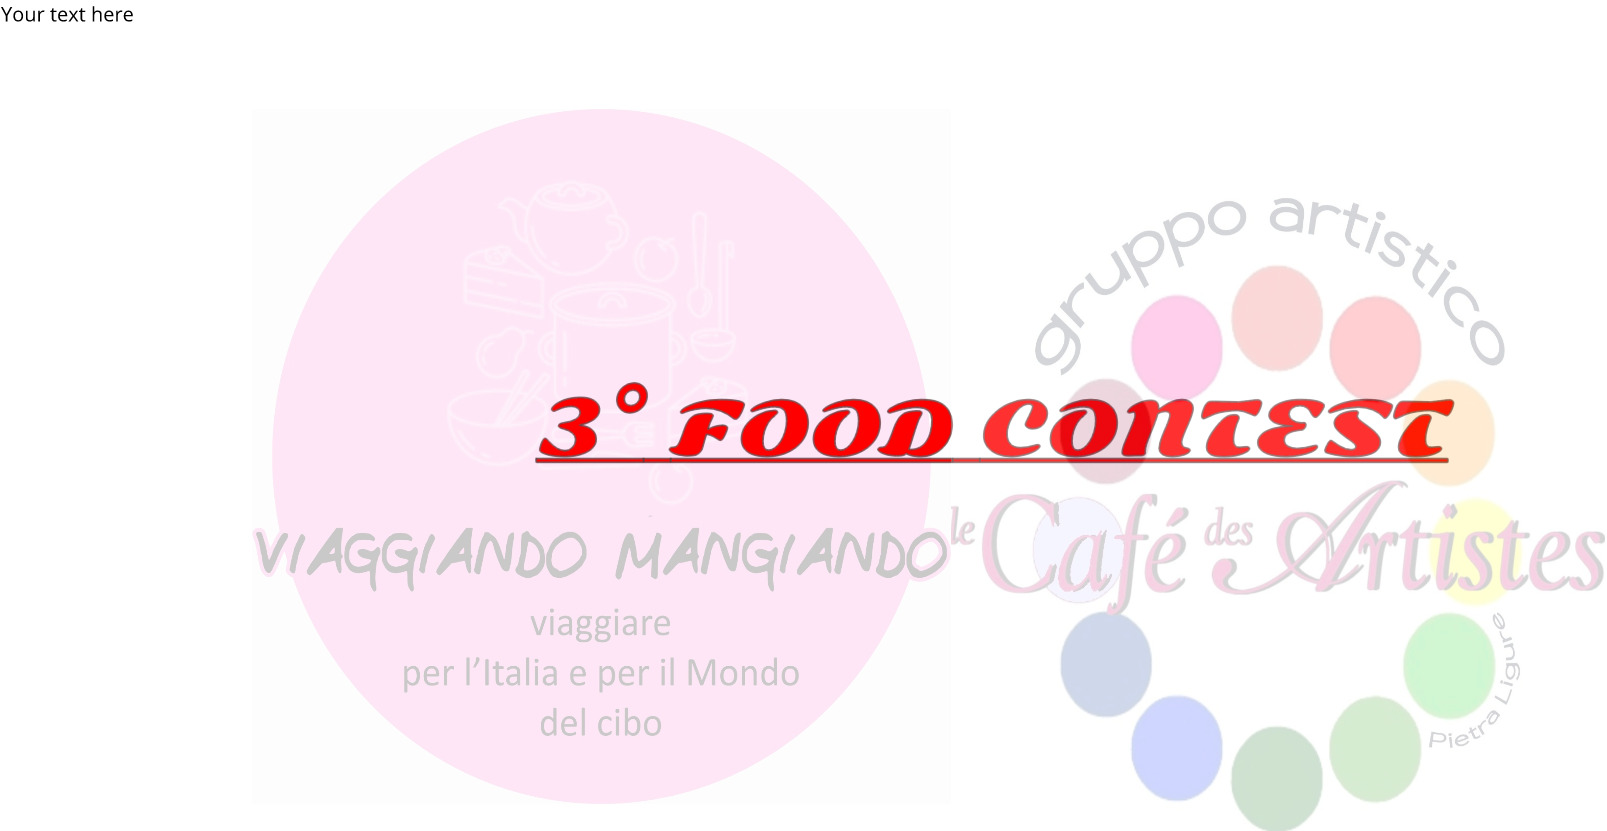 #FoodContest